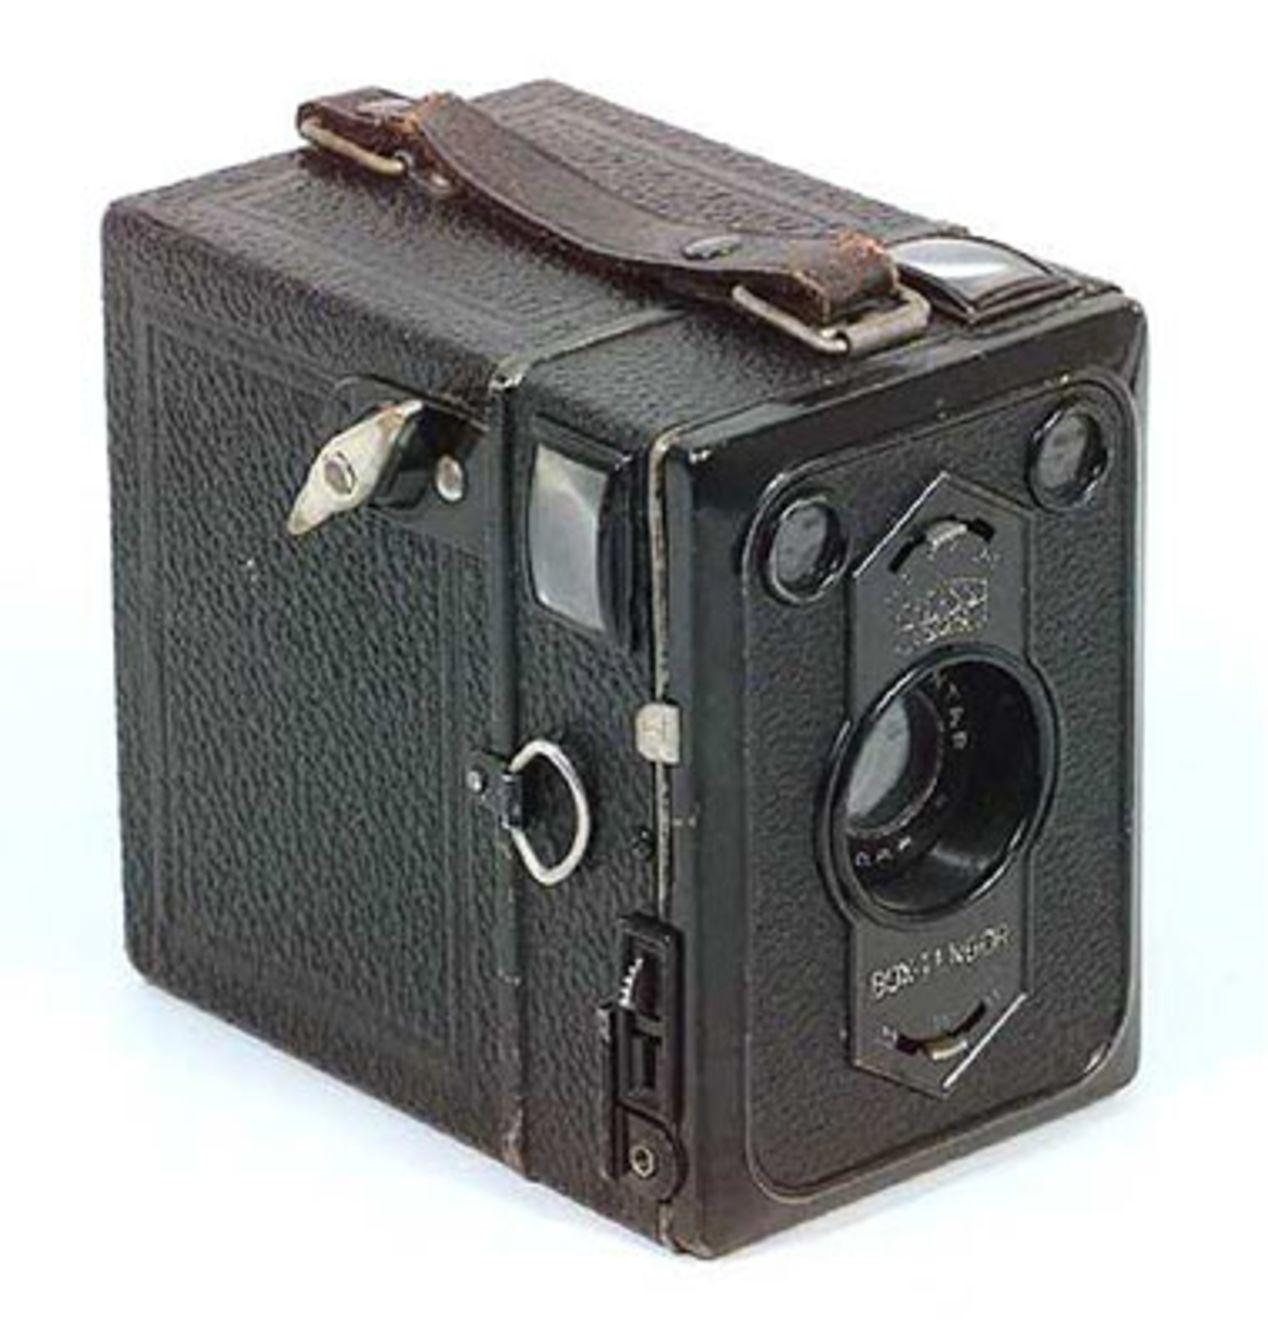 Box Tengor model 54/2